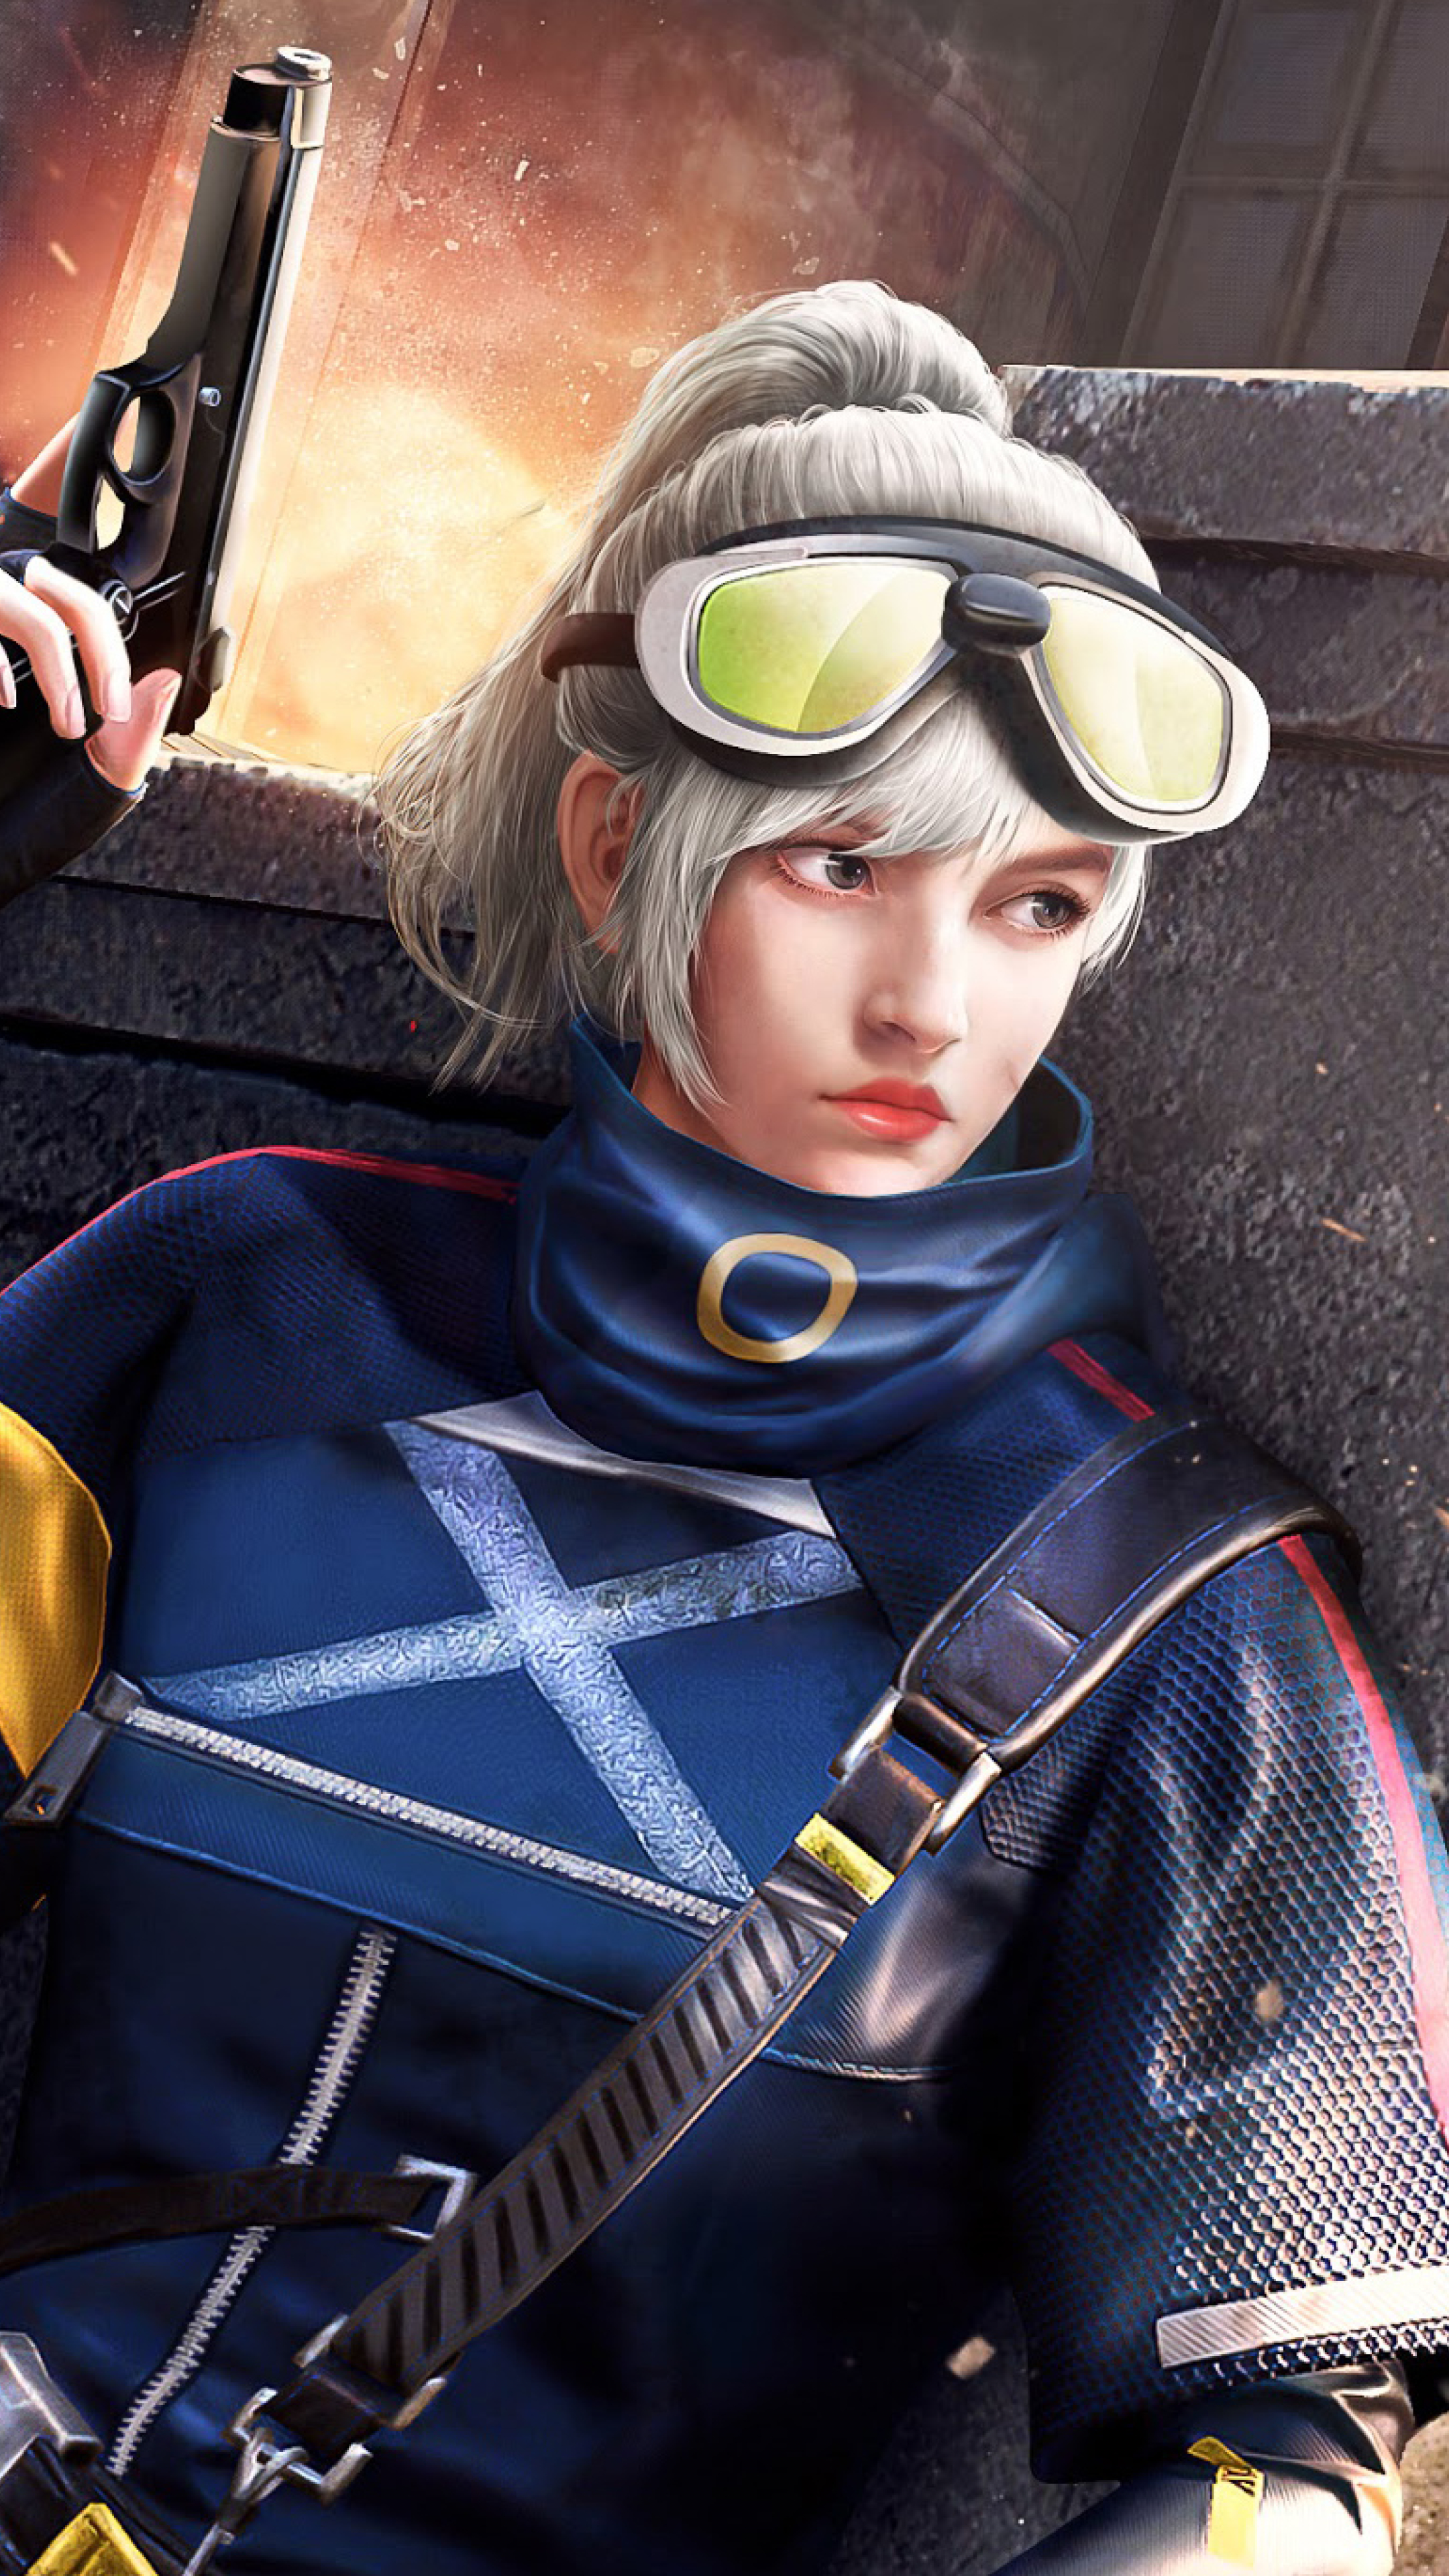 2160x3840 Sniper Girl Playerunknowns Battlegrounds Sony